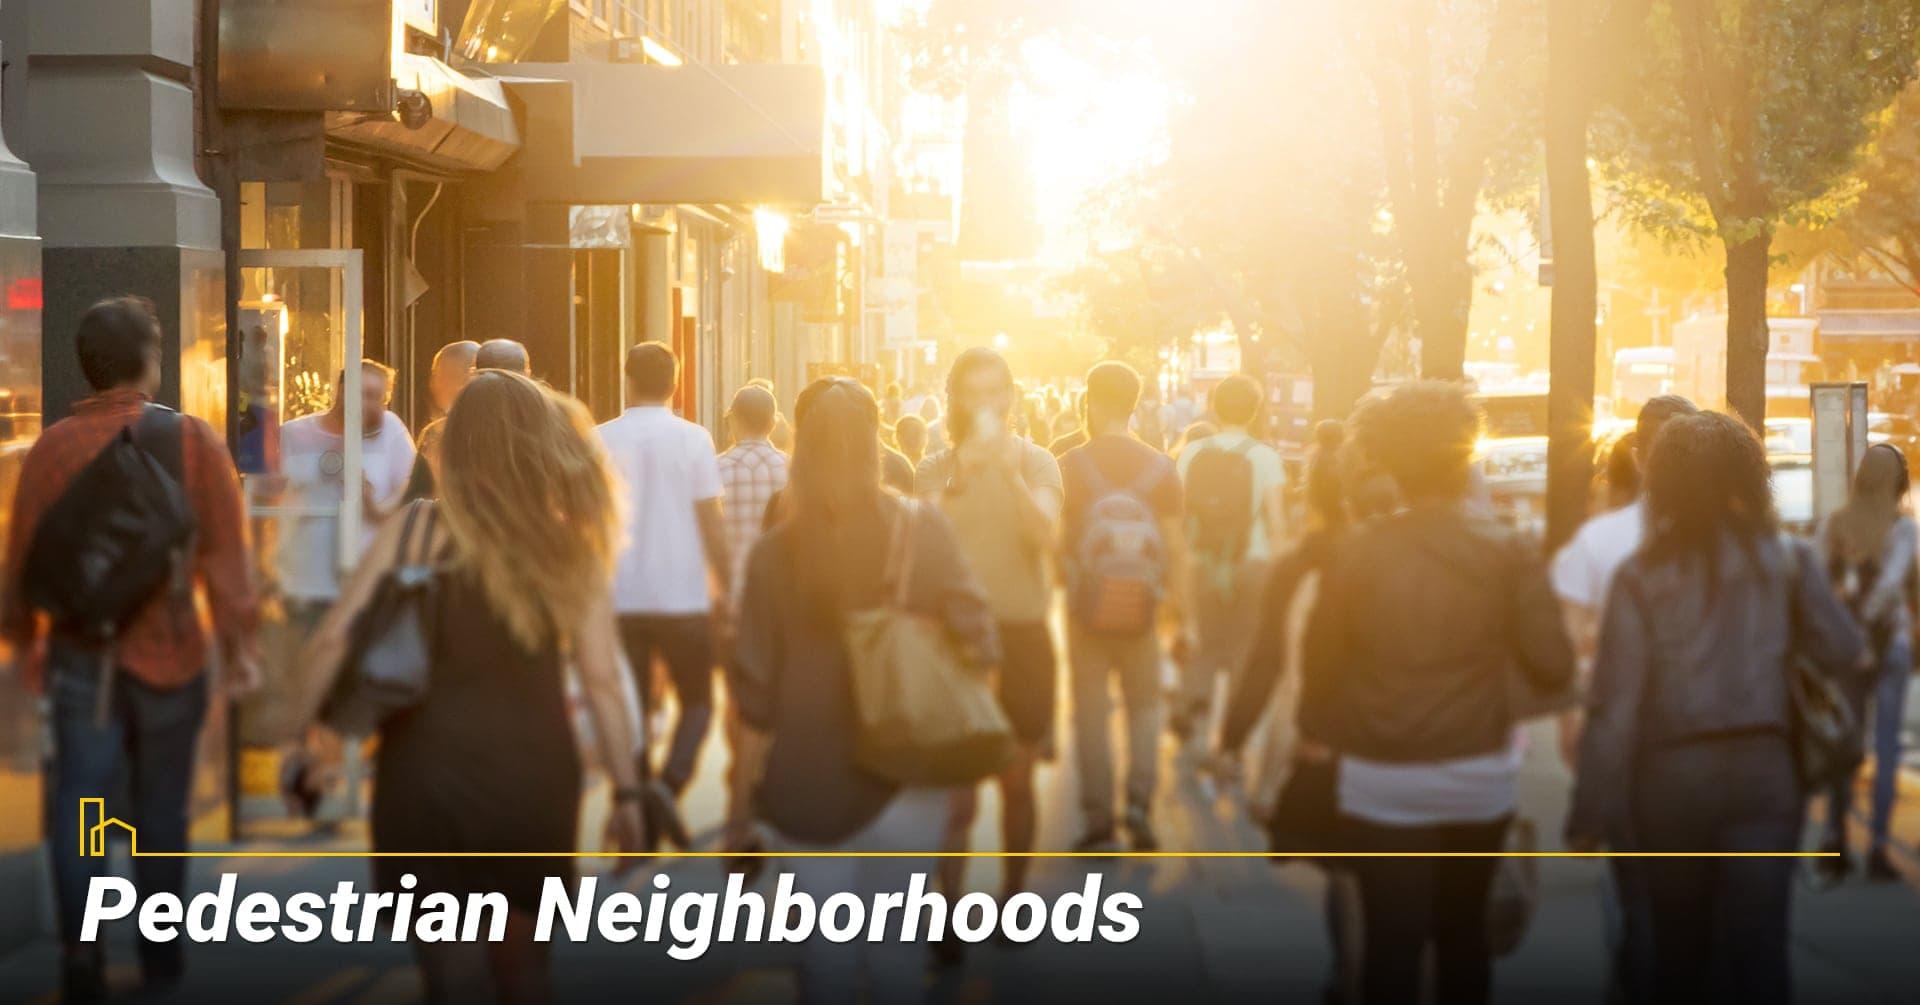 Pedestrian Neighborhoods, busy neighborhoods